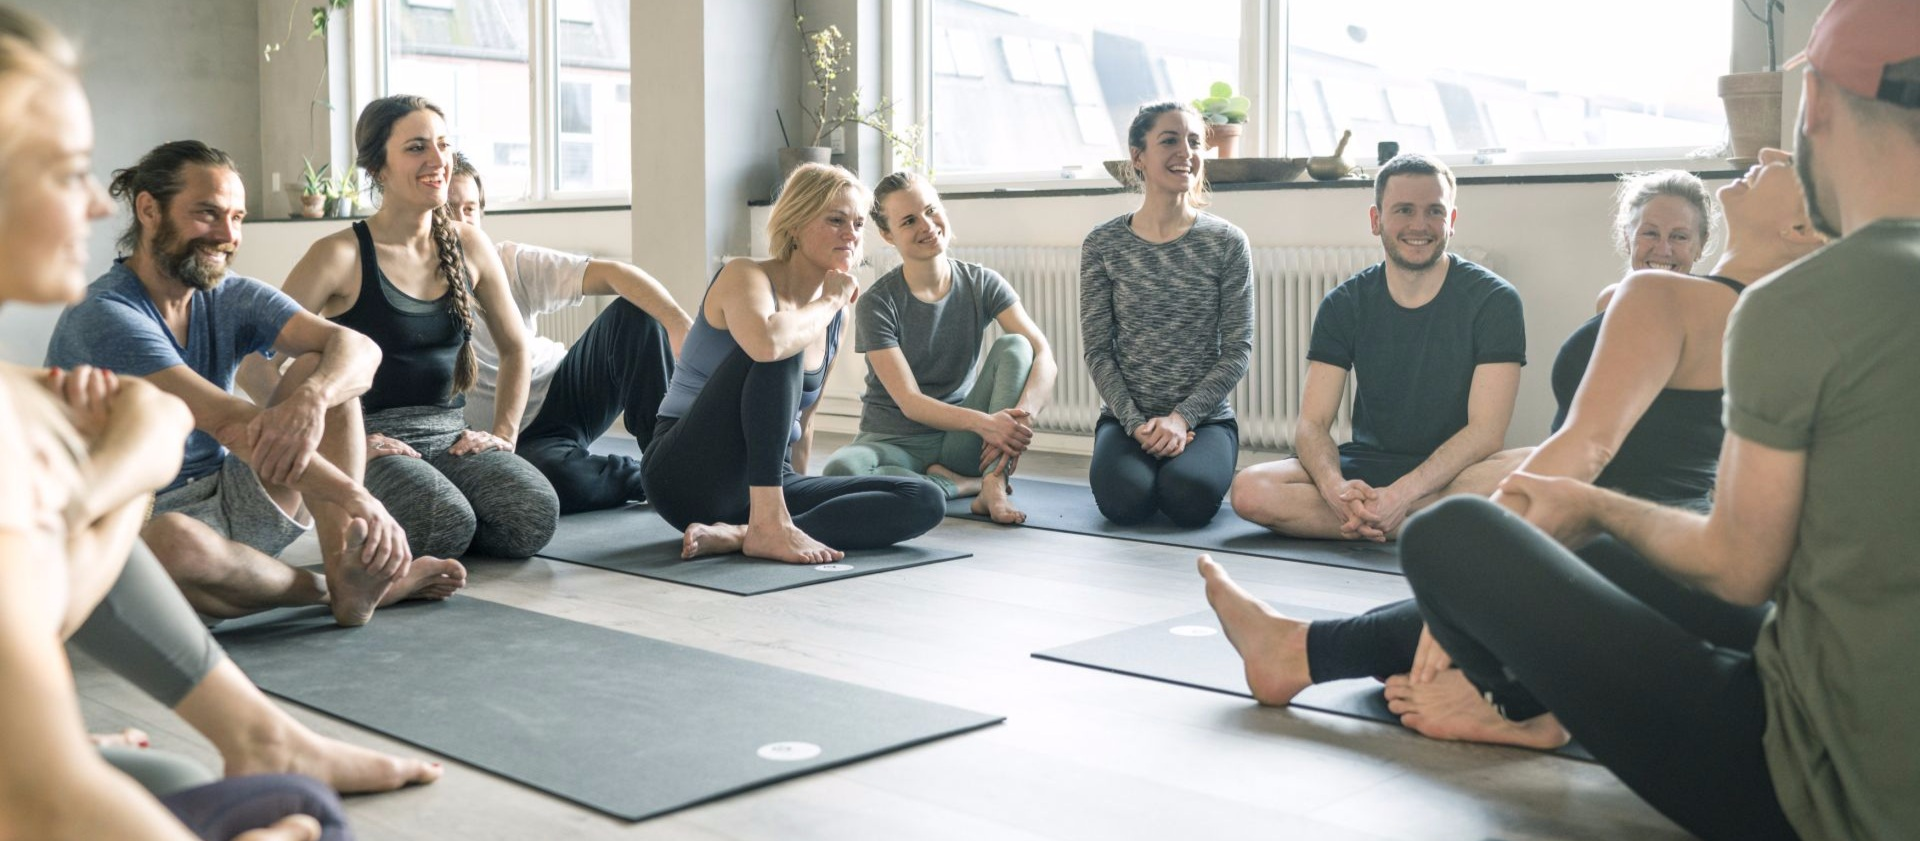 Communite-chant-theyogaflat-copenhagen-yoga-flat